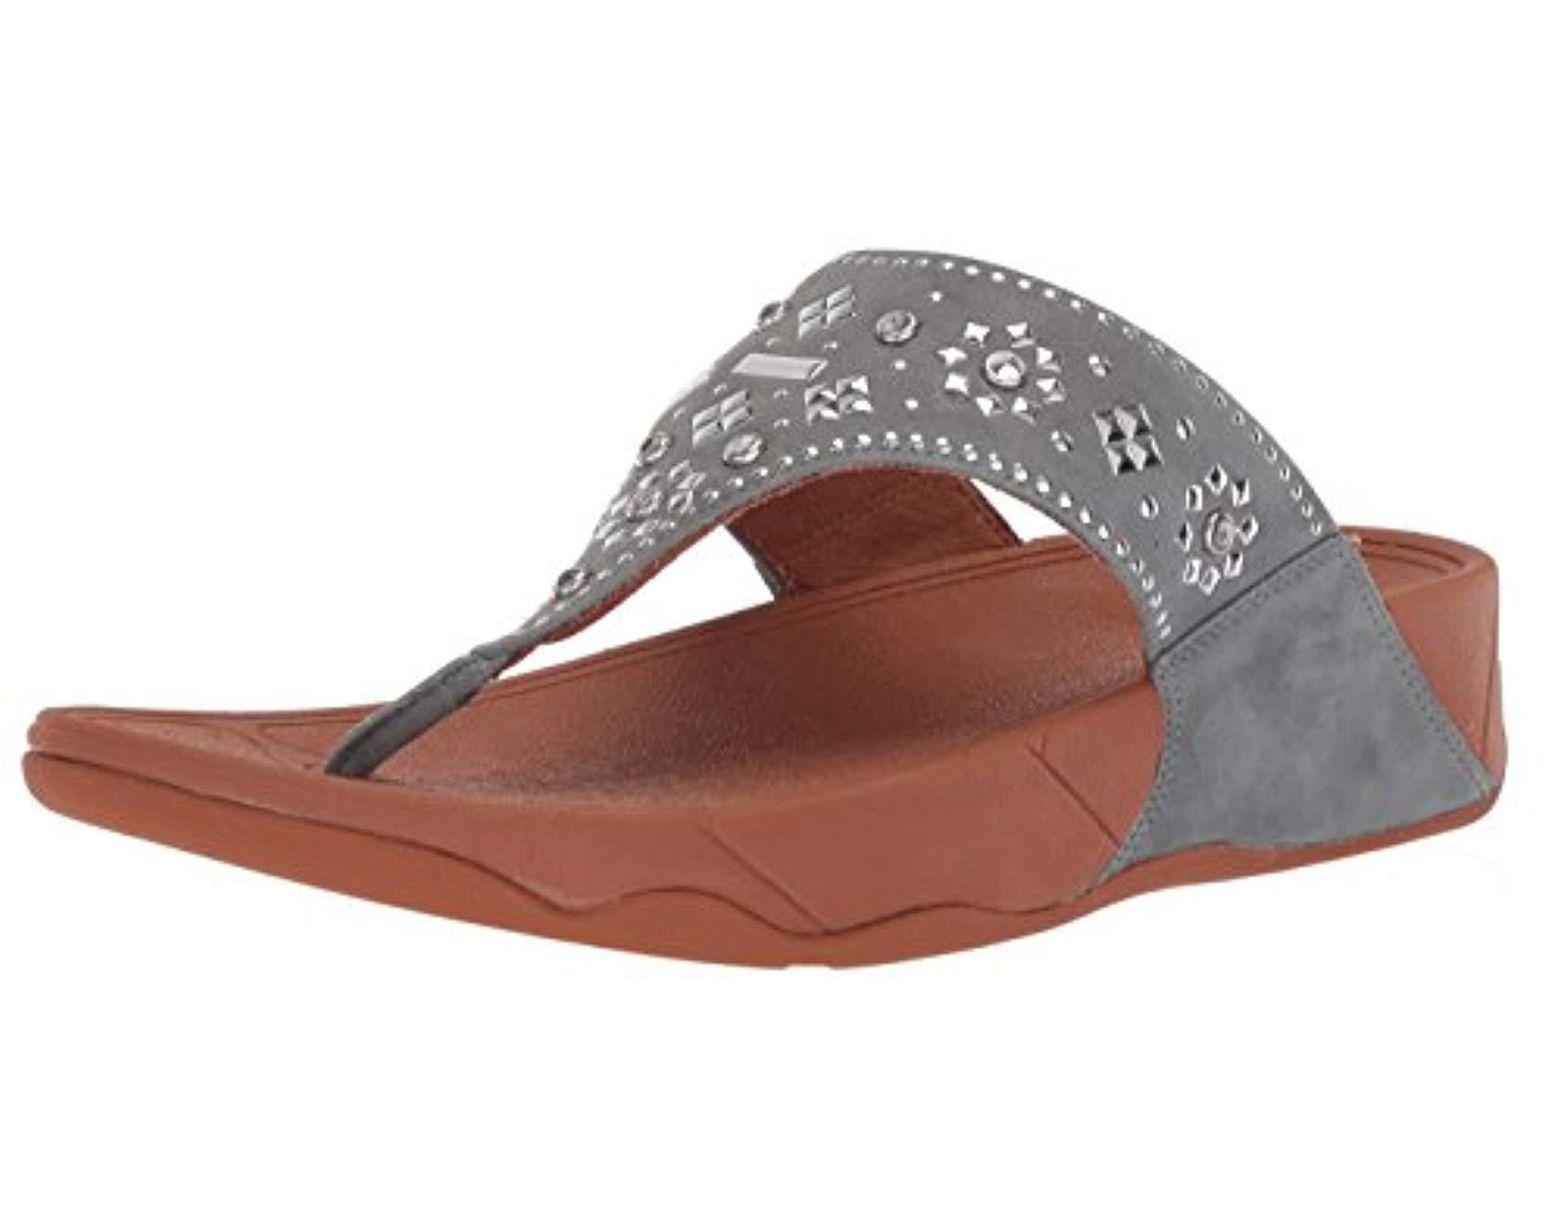 Toe Thong Stud Sandals Women's Aztek Lulu Suede 8wPnOk0X